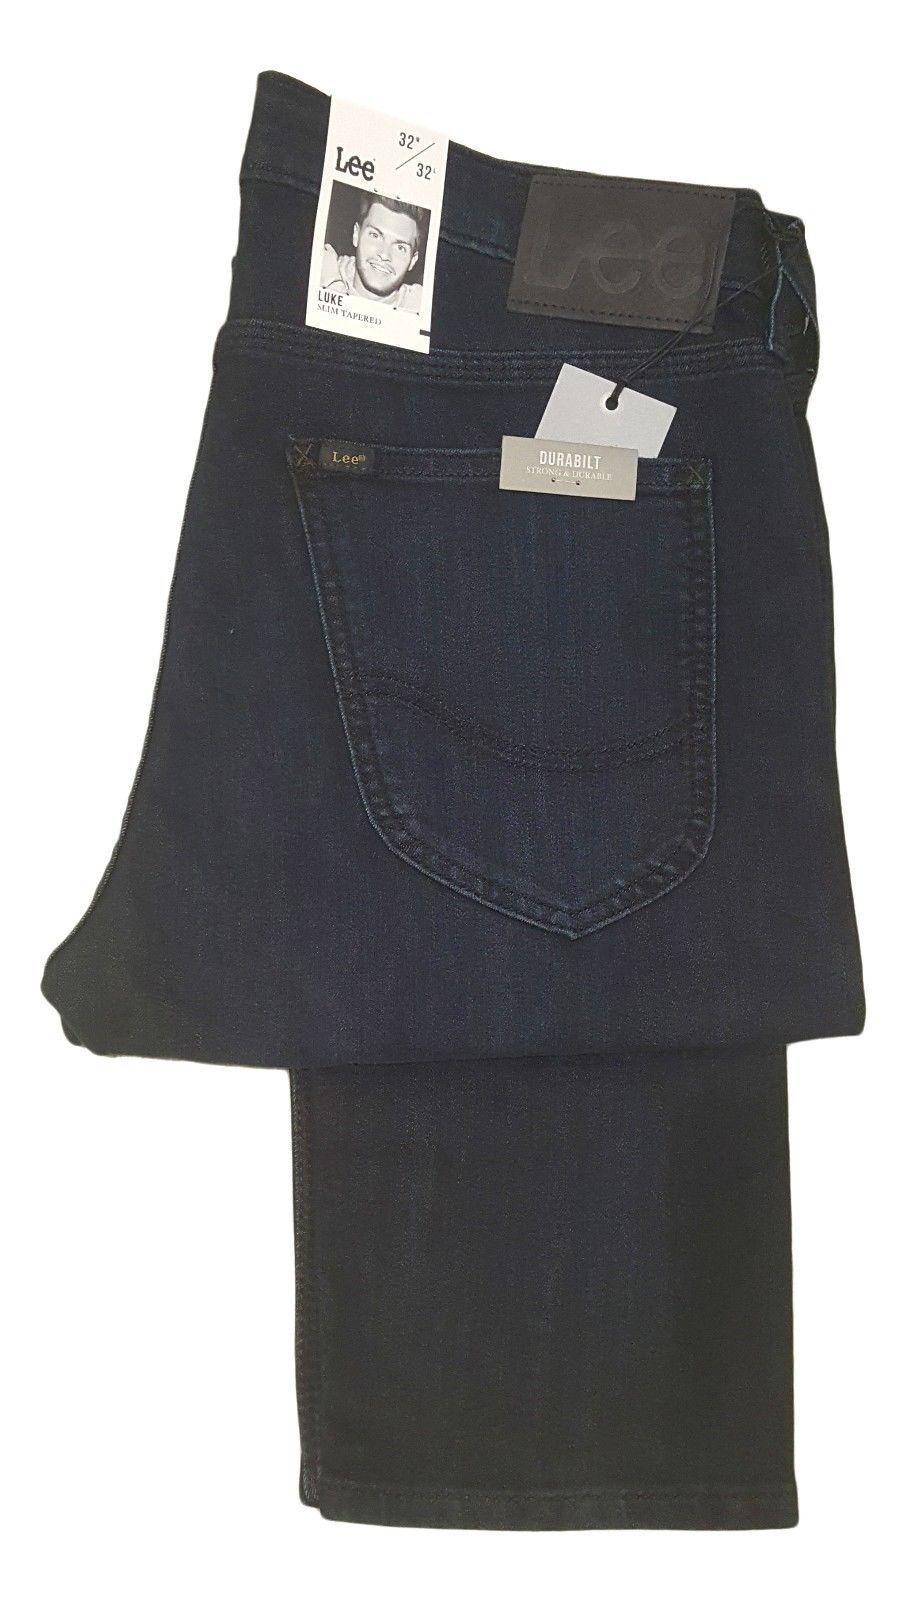 Mens Lee Luke Slim Fit Tapered Leg Fashion Jeans AAEC - Dark Ink bluee